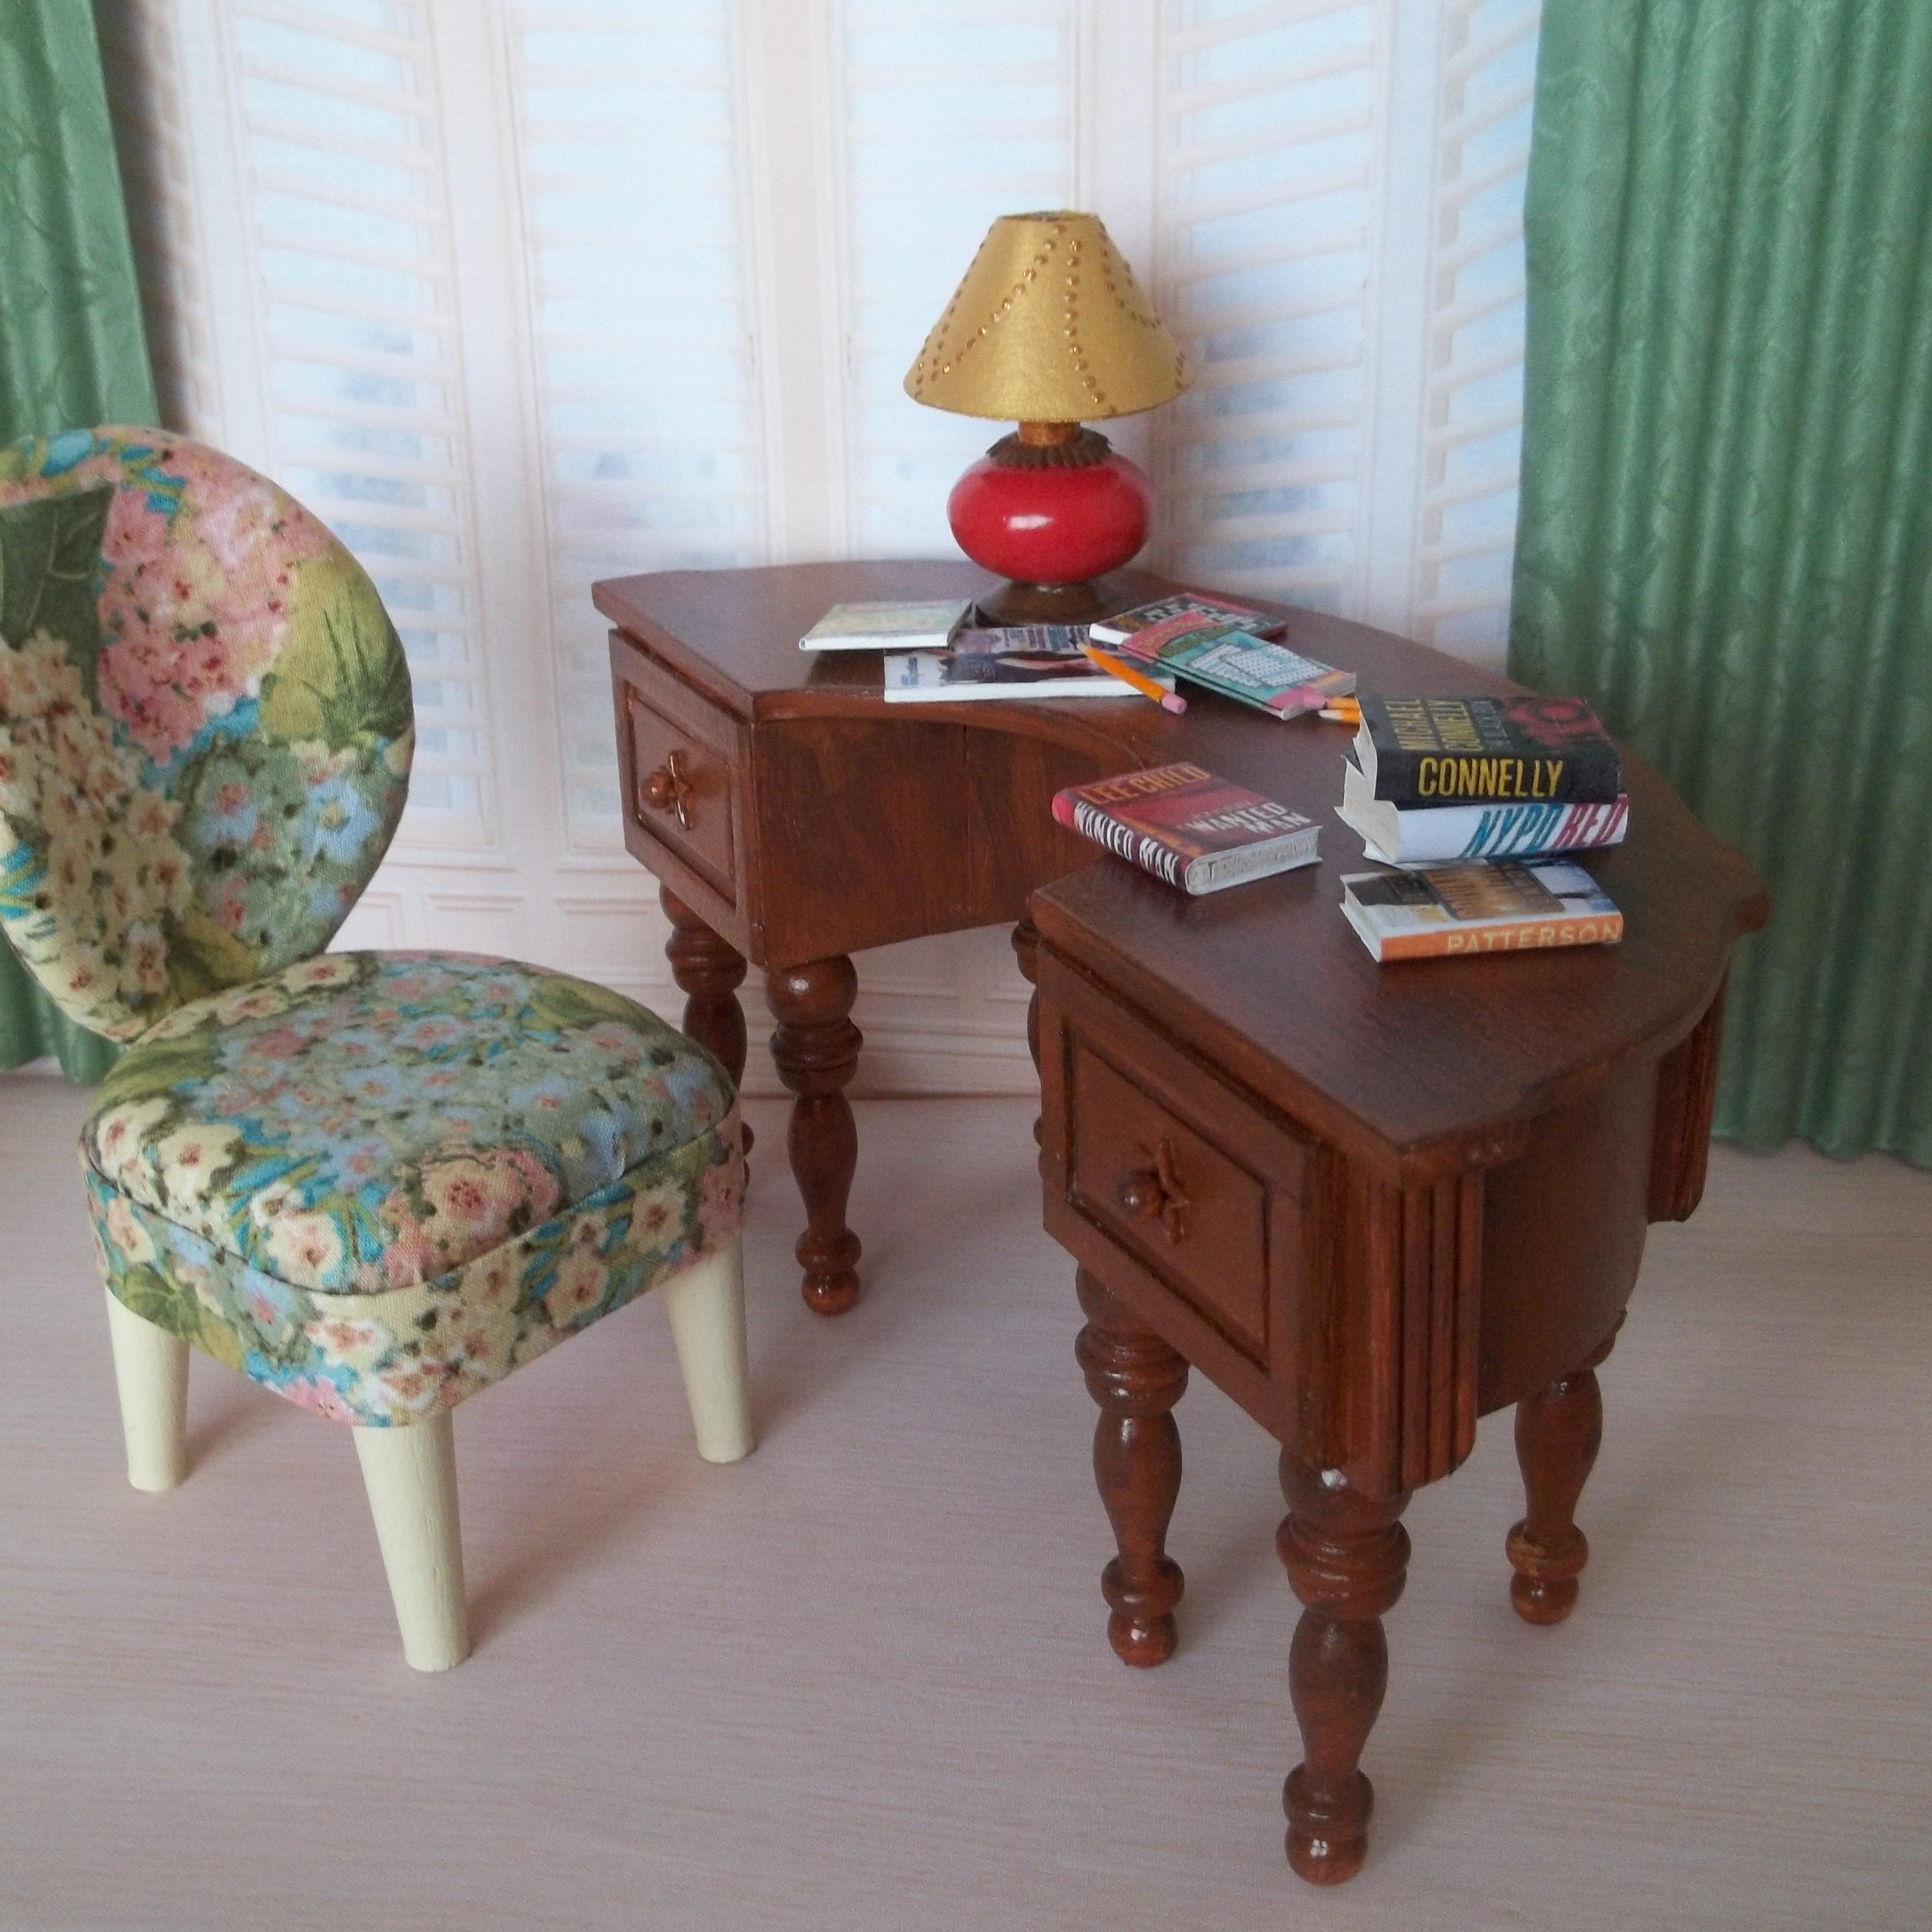 Custom Ordered BJD And Barbie Doll Furniture By Bedsbystar